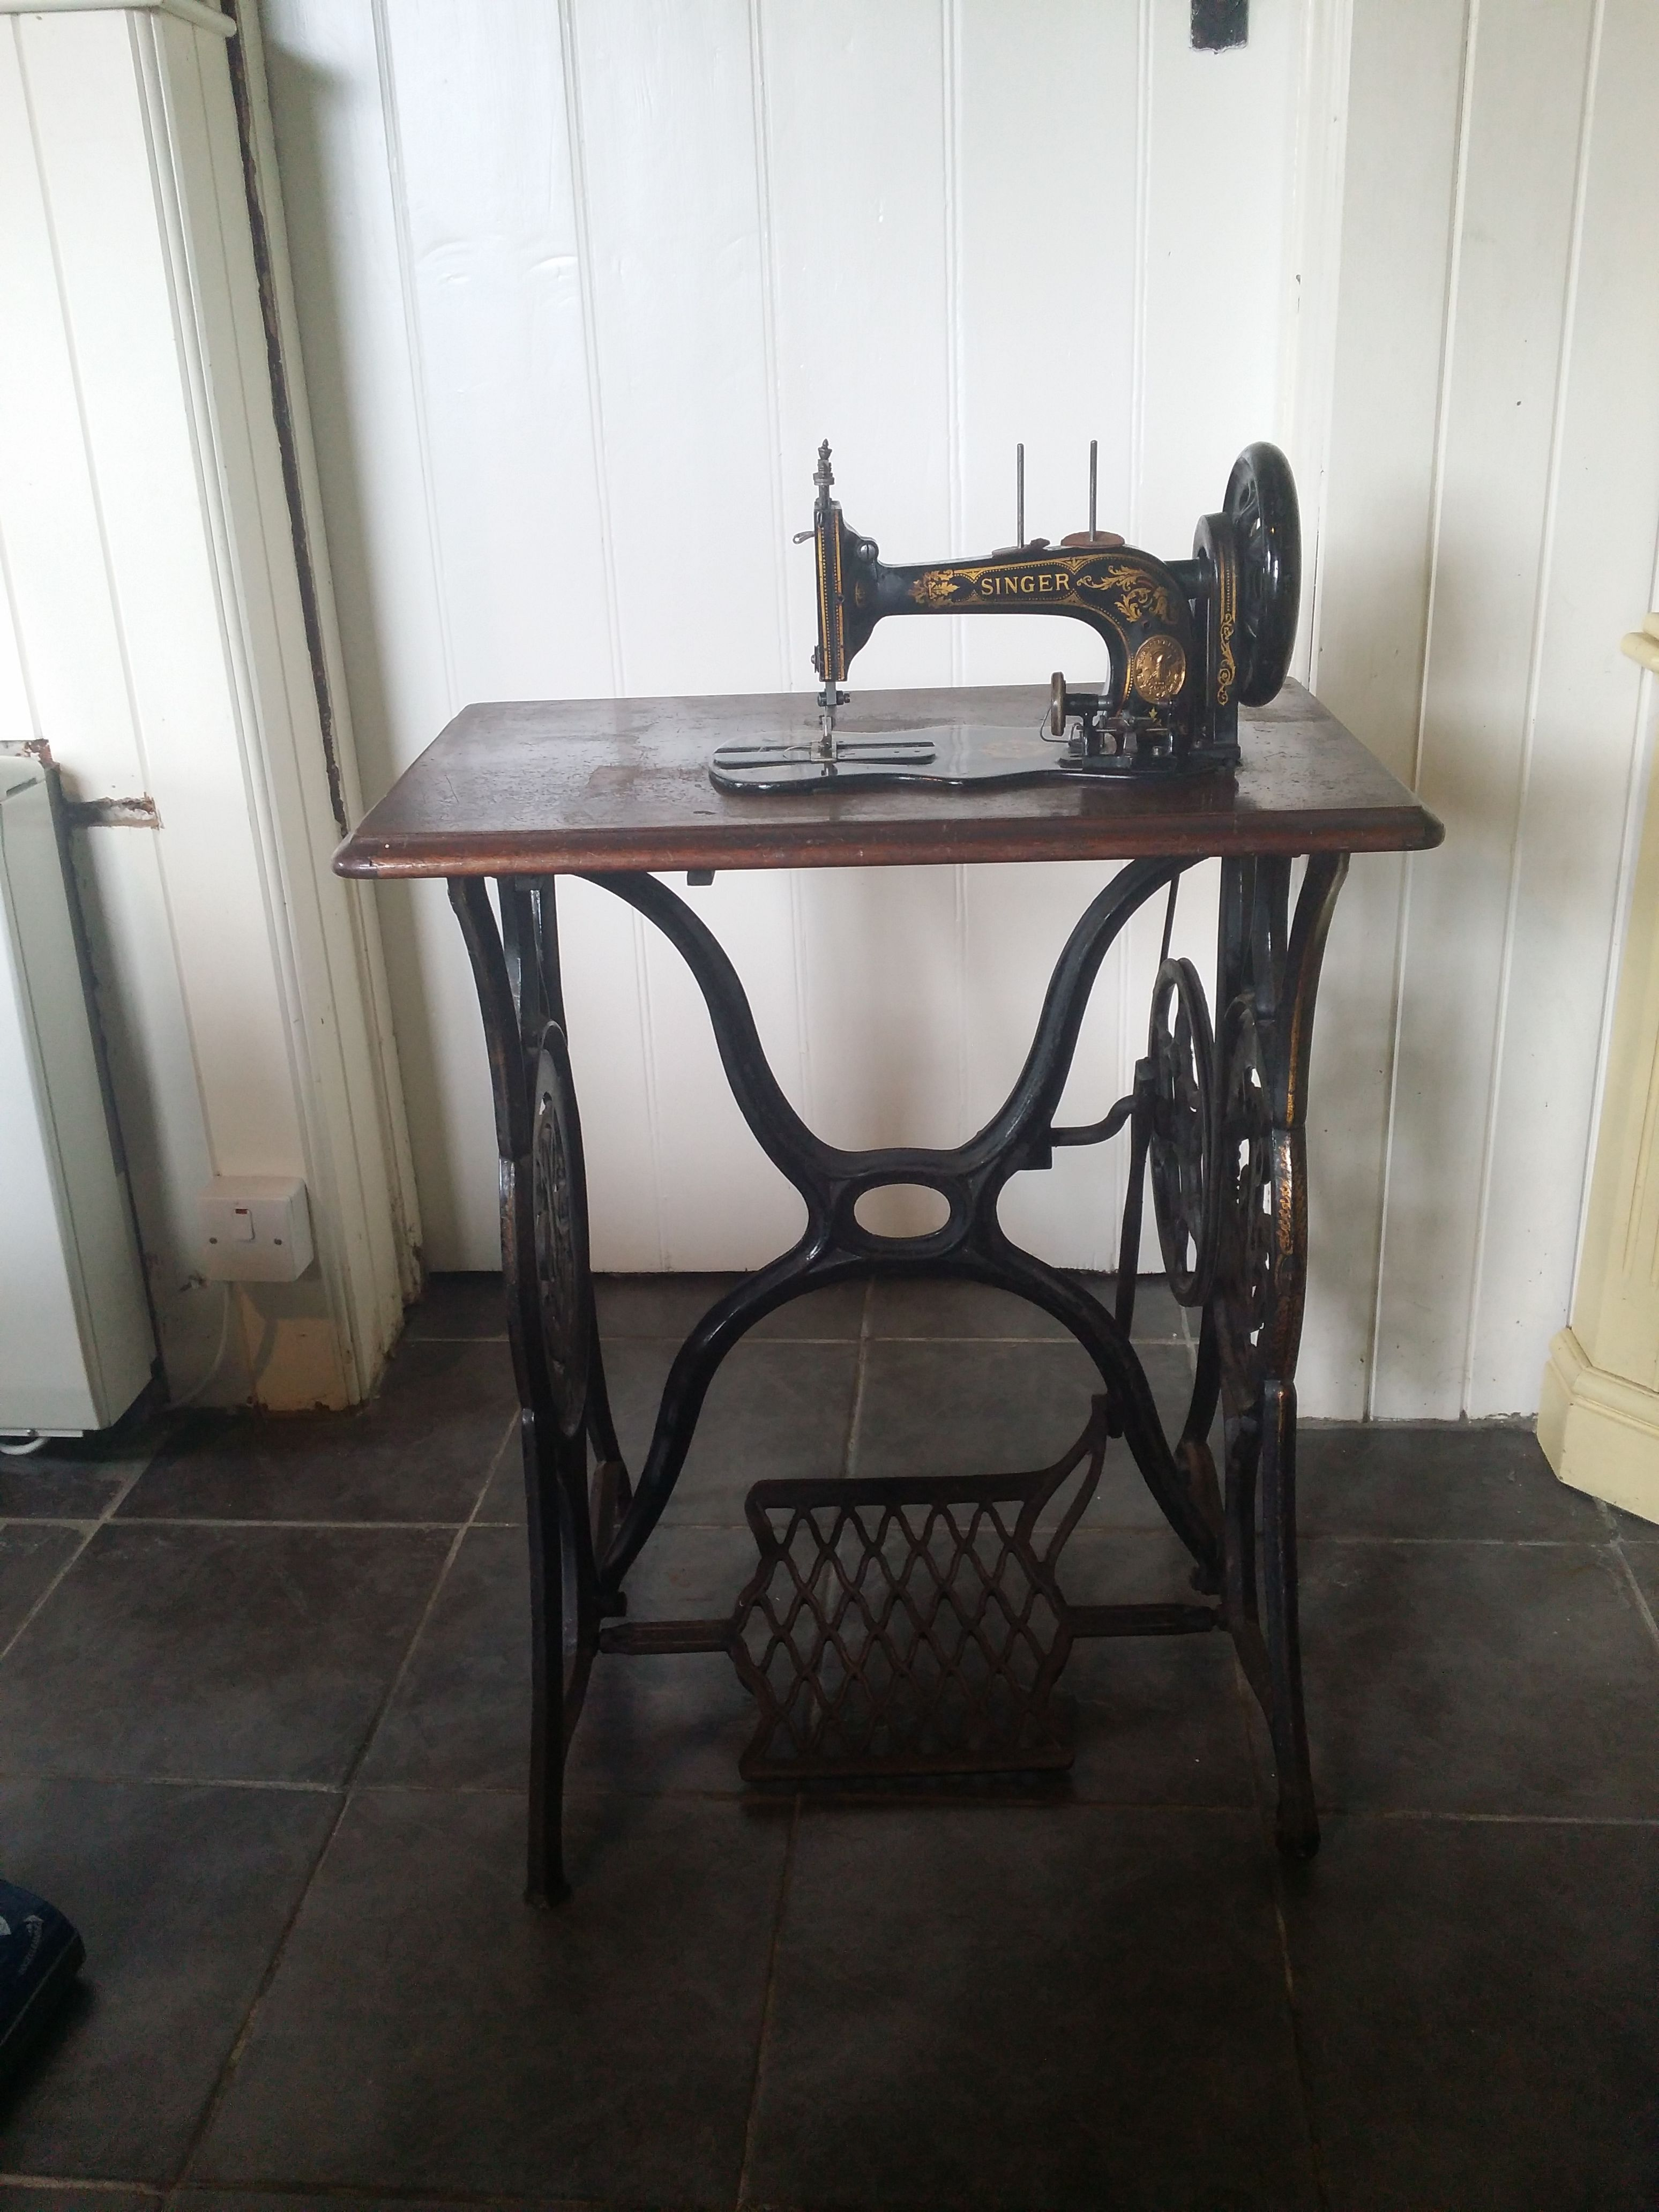 Singer Sewing Machine Serial Number Value